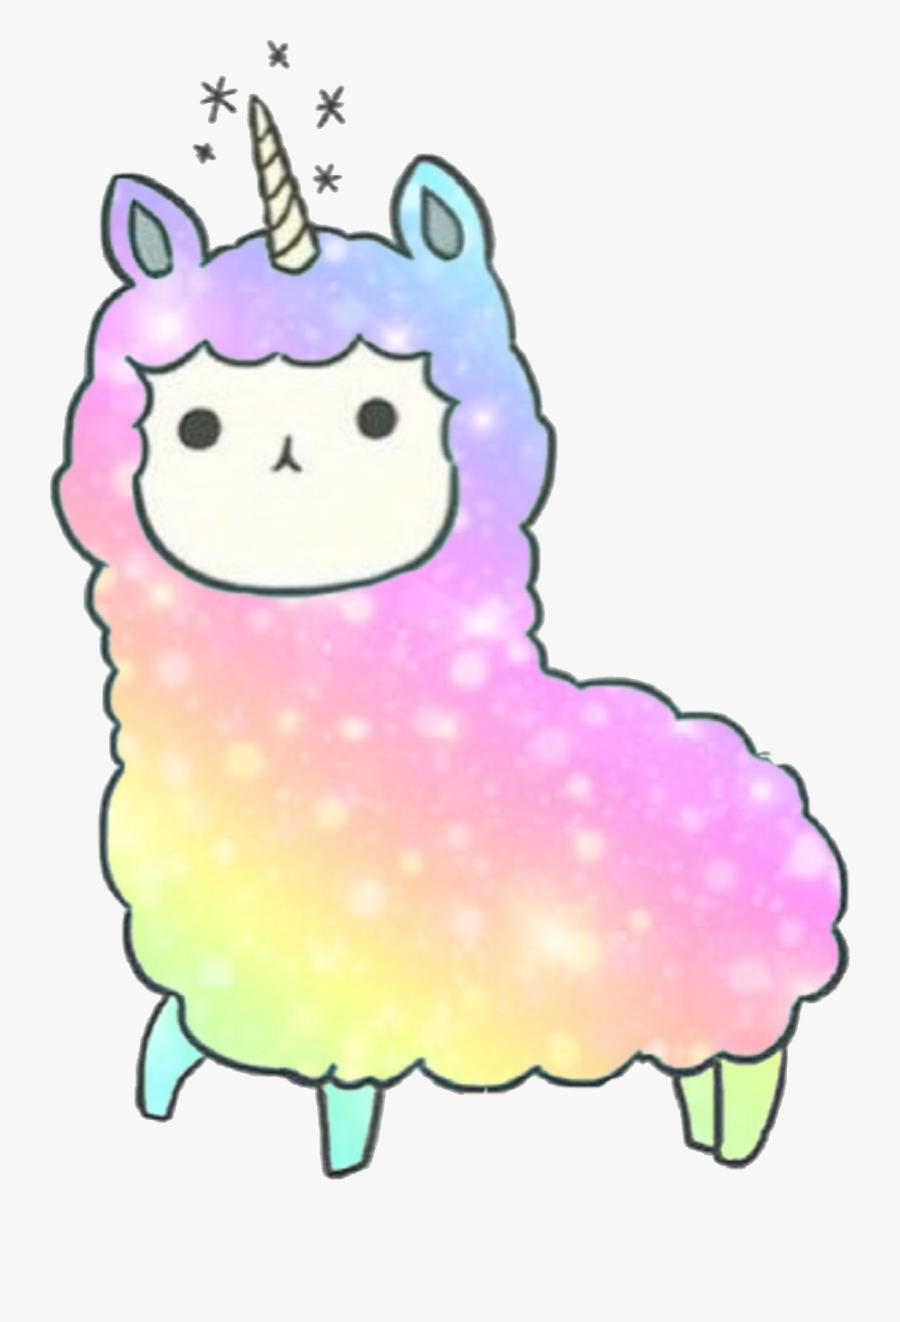 #kawaii #llama #llamacorn Dedicated To @kandygamergirl - Kawaii Unicorn Coloring Pages, Transparent Clipart